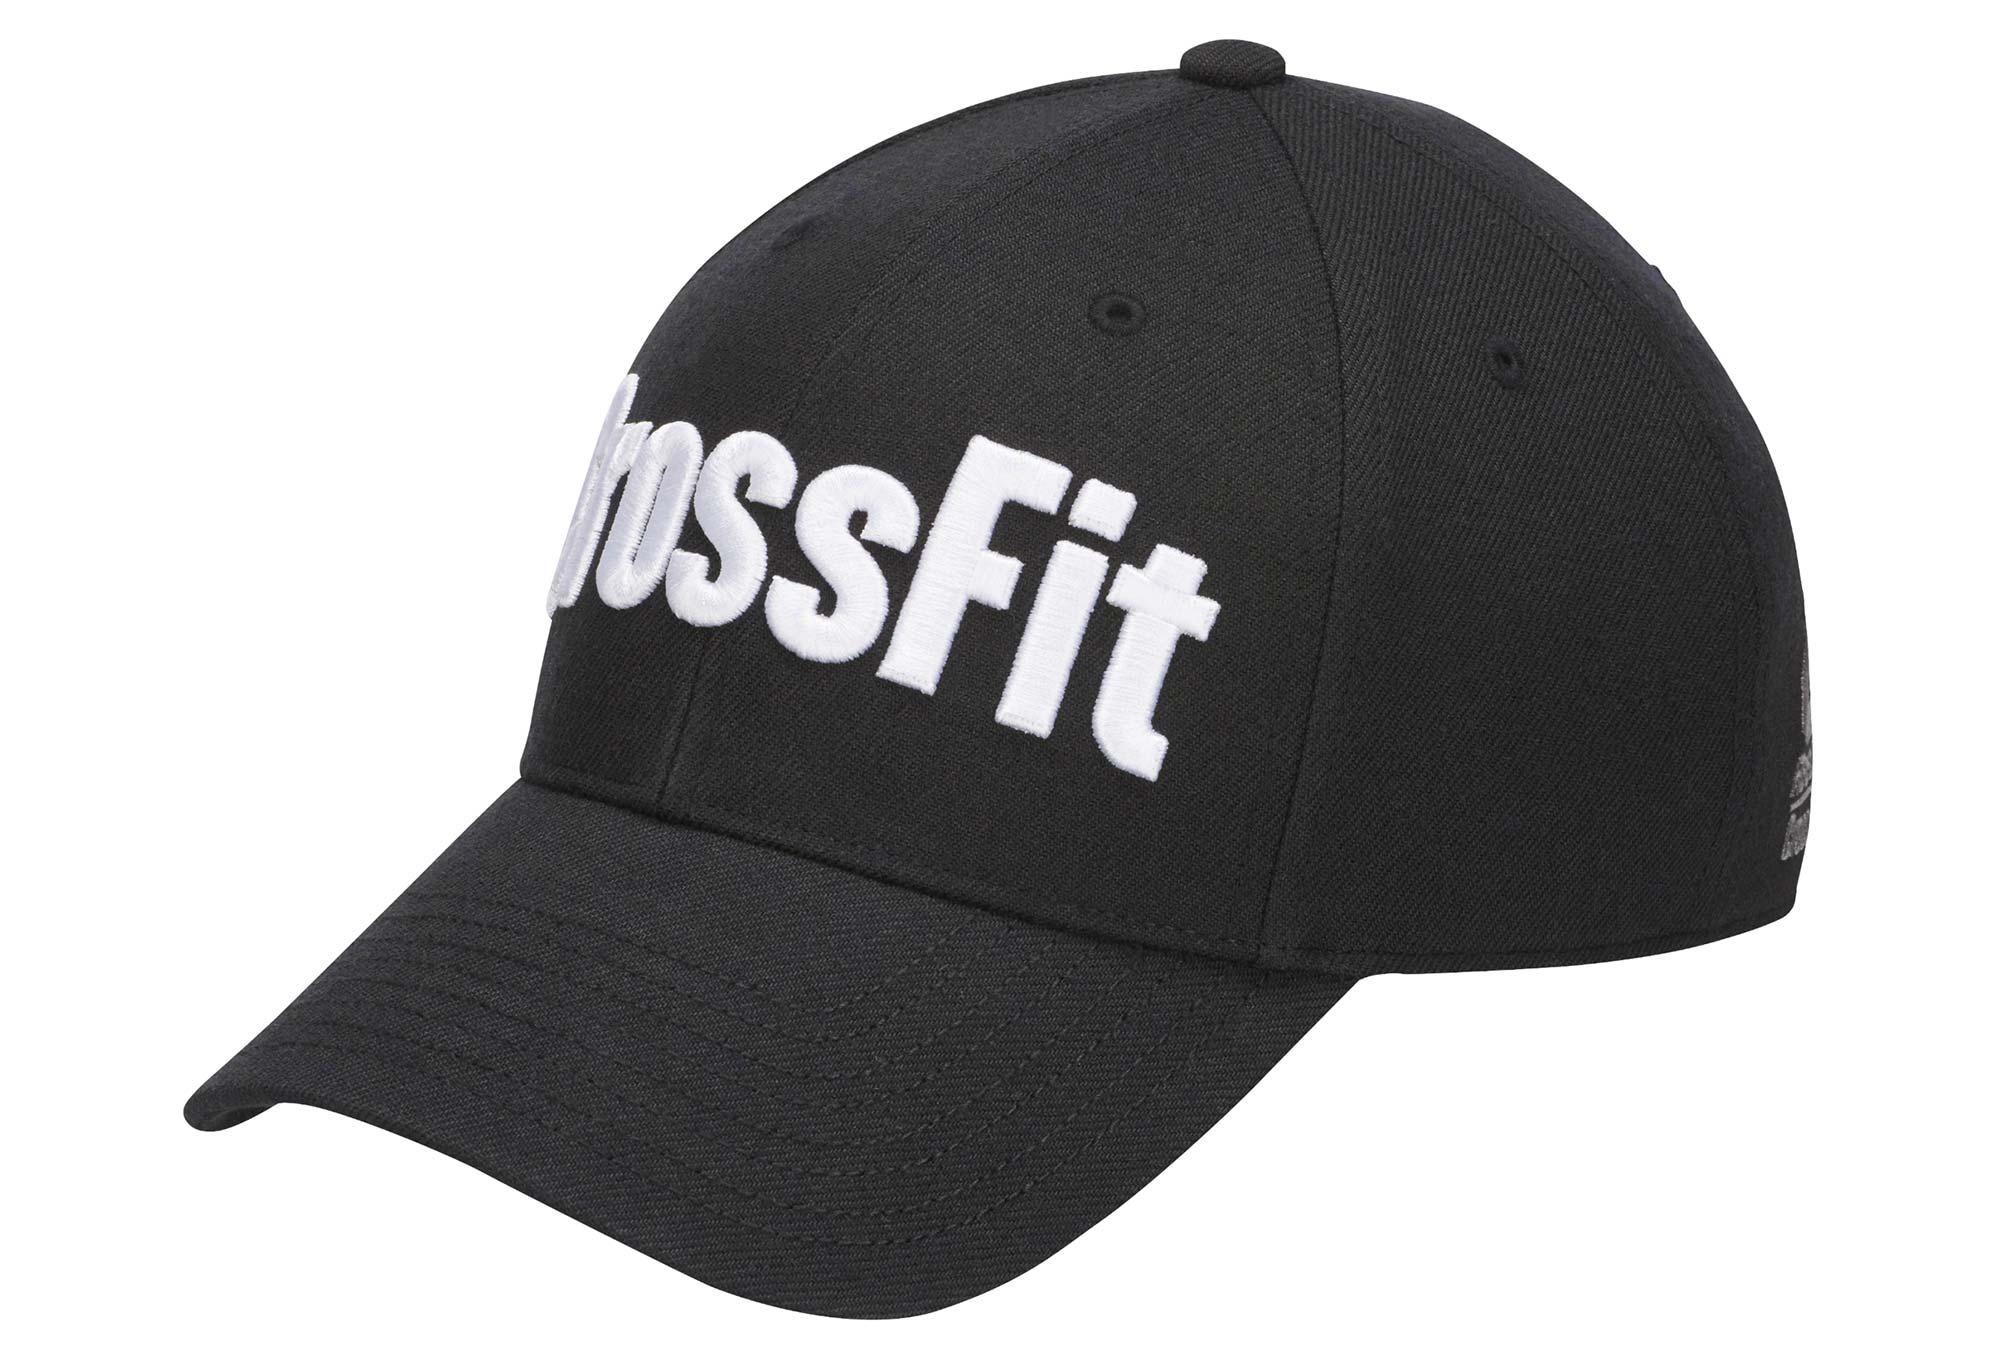 Reebok CrossFit Cap Black  21a8220dae9